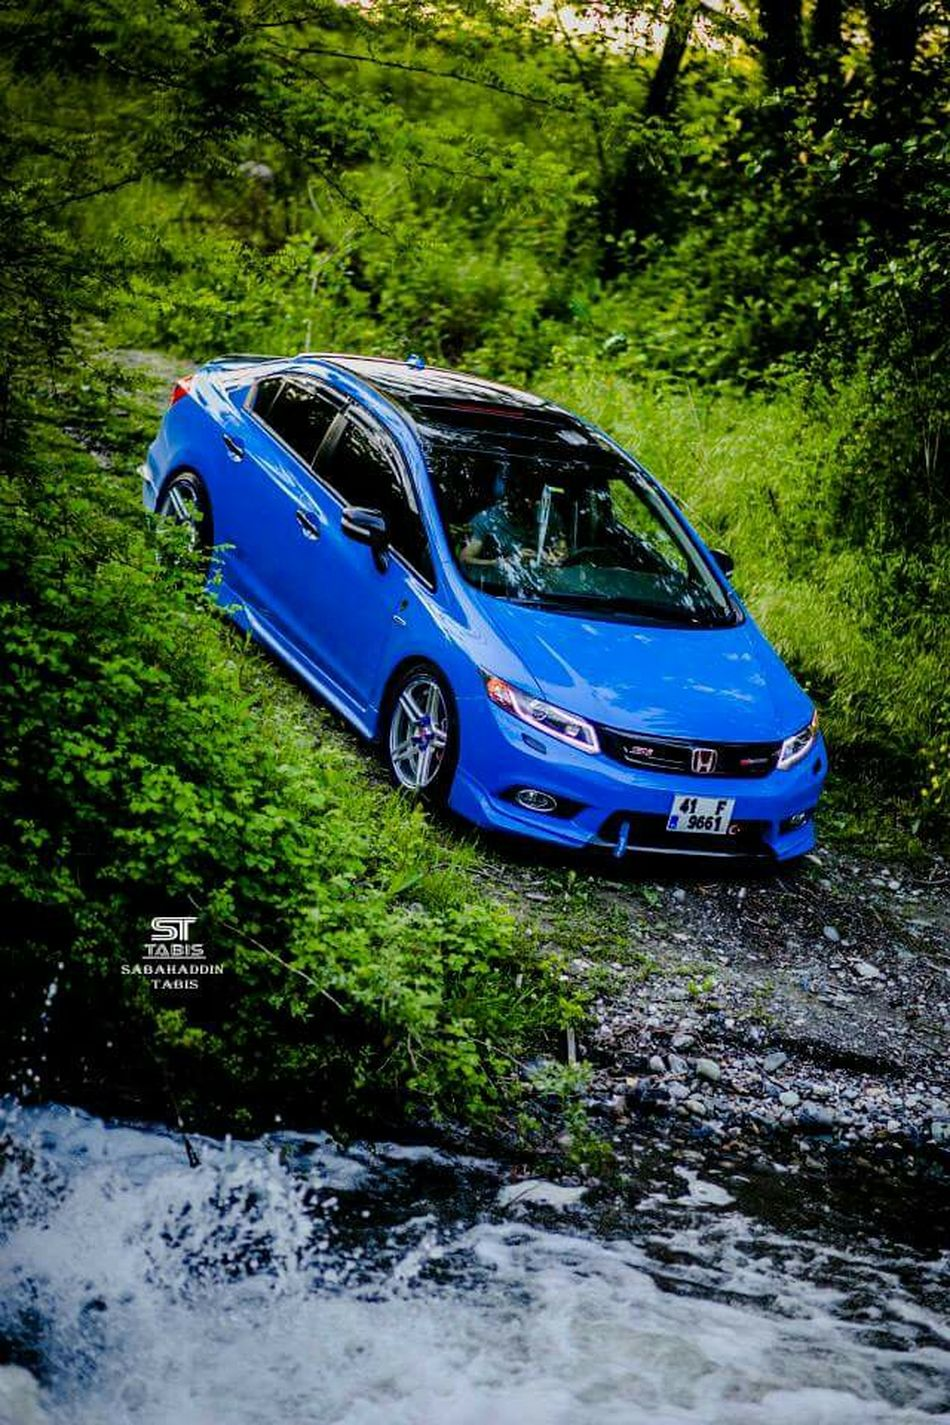 Auto Honda. Civic Car Blue Sabahaddintabisphotography Diffetent Life Good Perfect #action facebook ve instagramdan takip edin sabahaddintabis